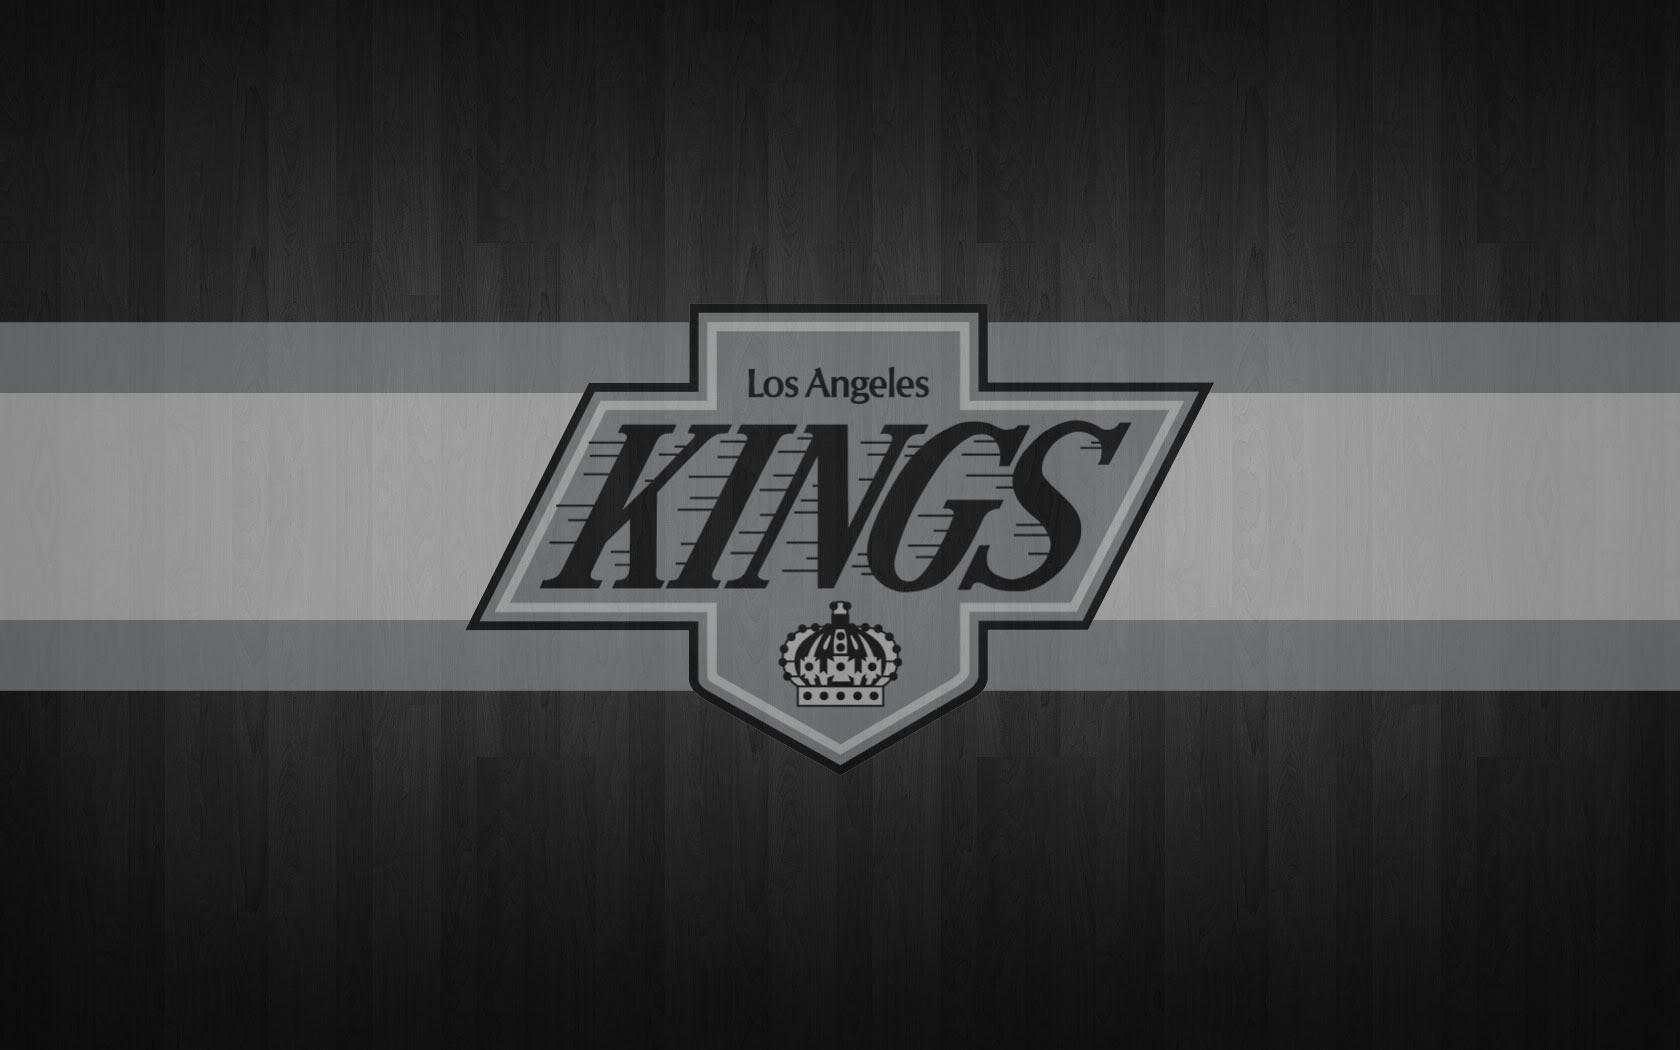 La kings wallpapers hd wallpapersafari - Hfboards kings ...